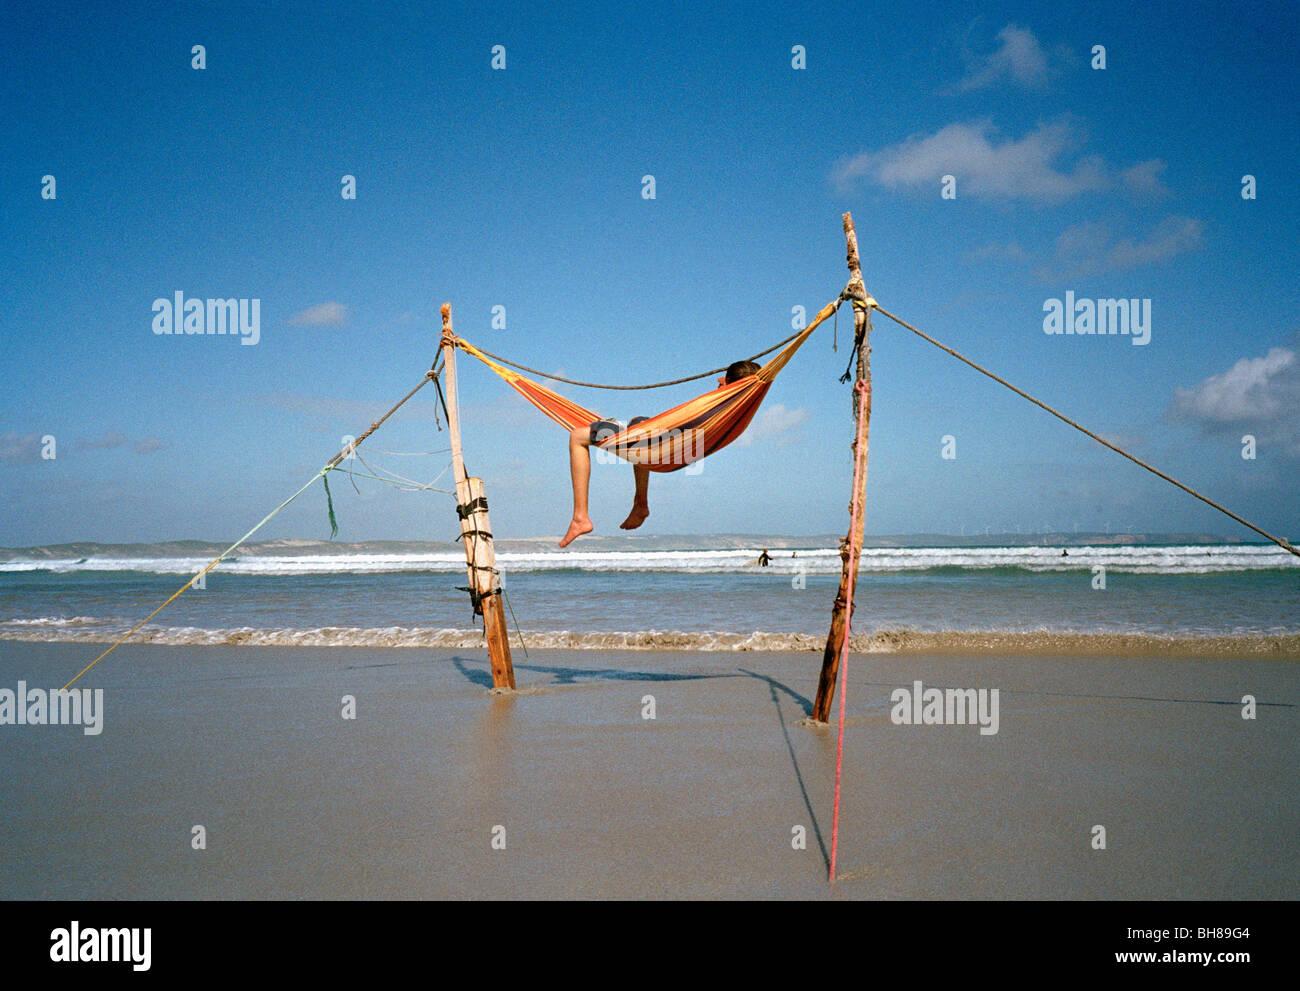 A man lying in a hammock on a beach - Stock Image